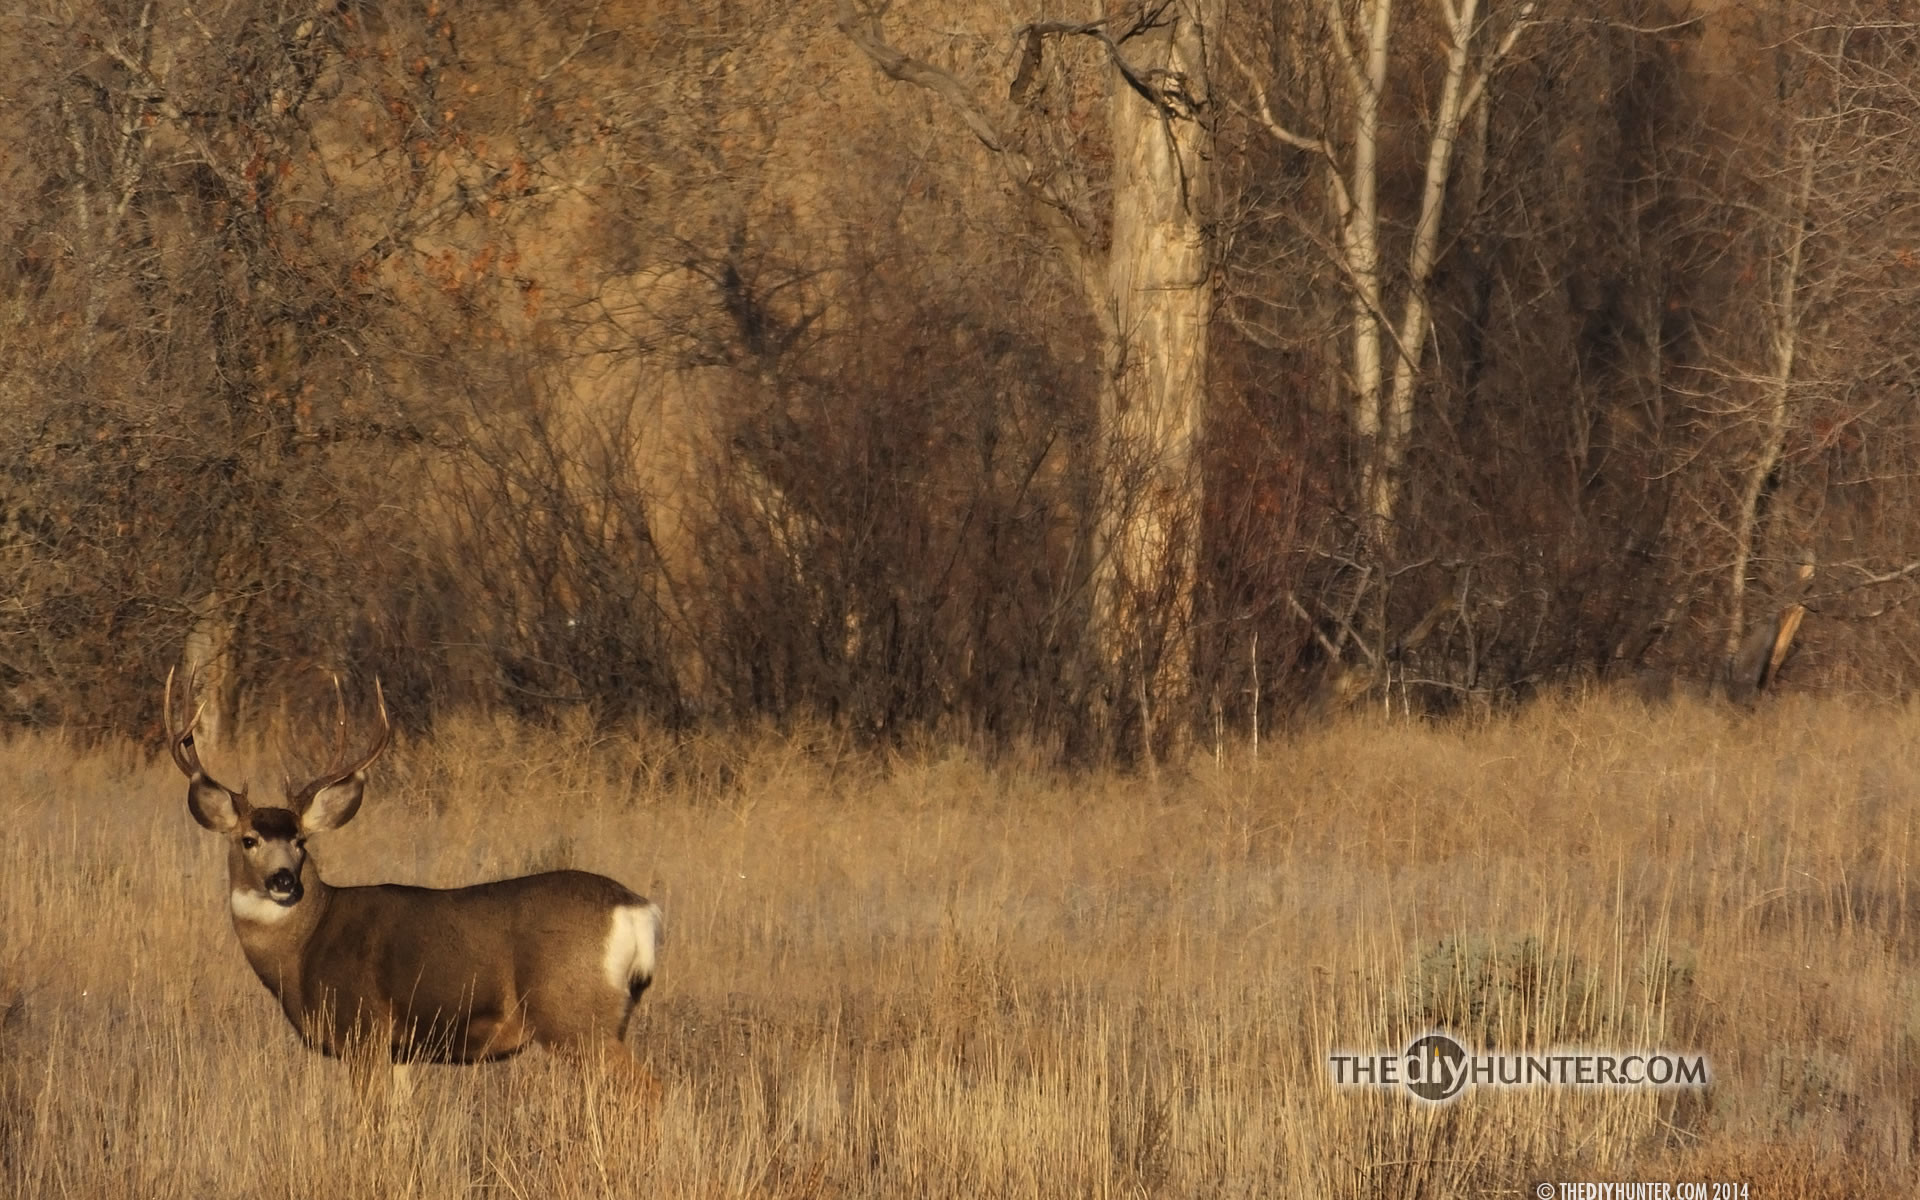 Bow hunting wallpaper 63 images - Free deer hunting screensavers ...